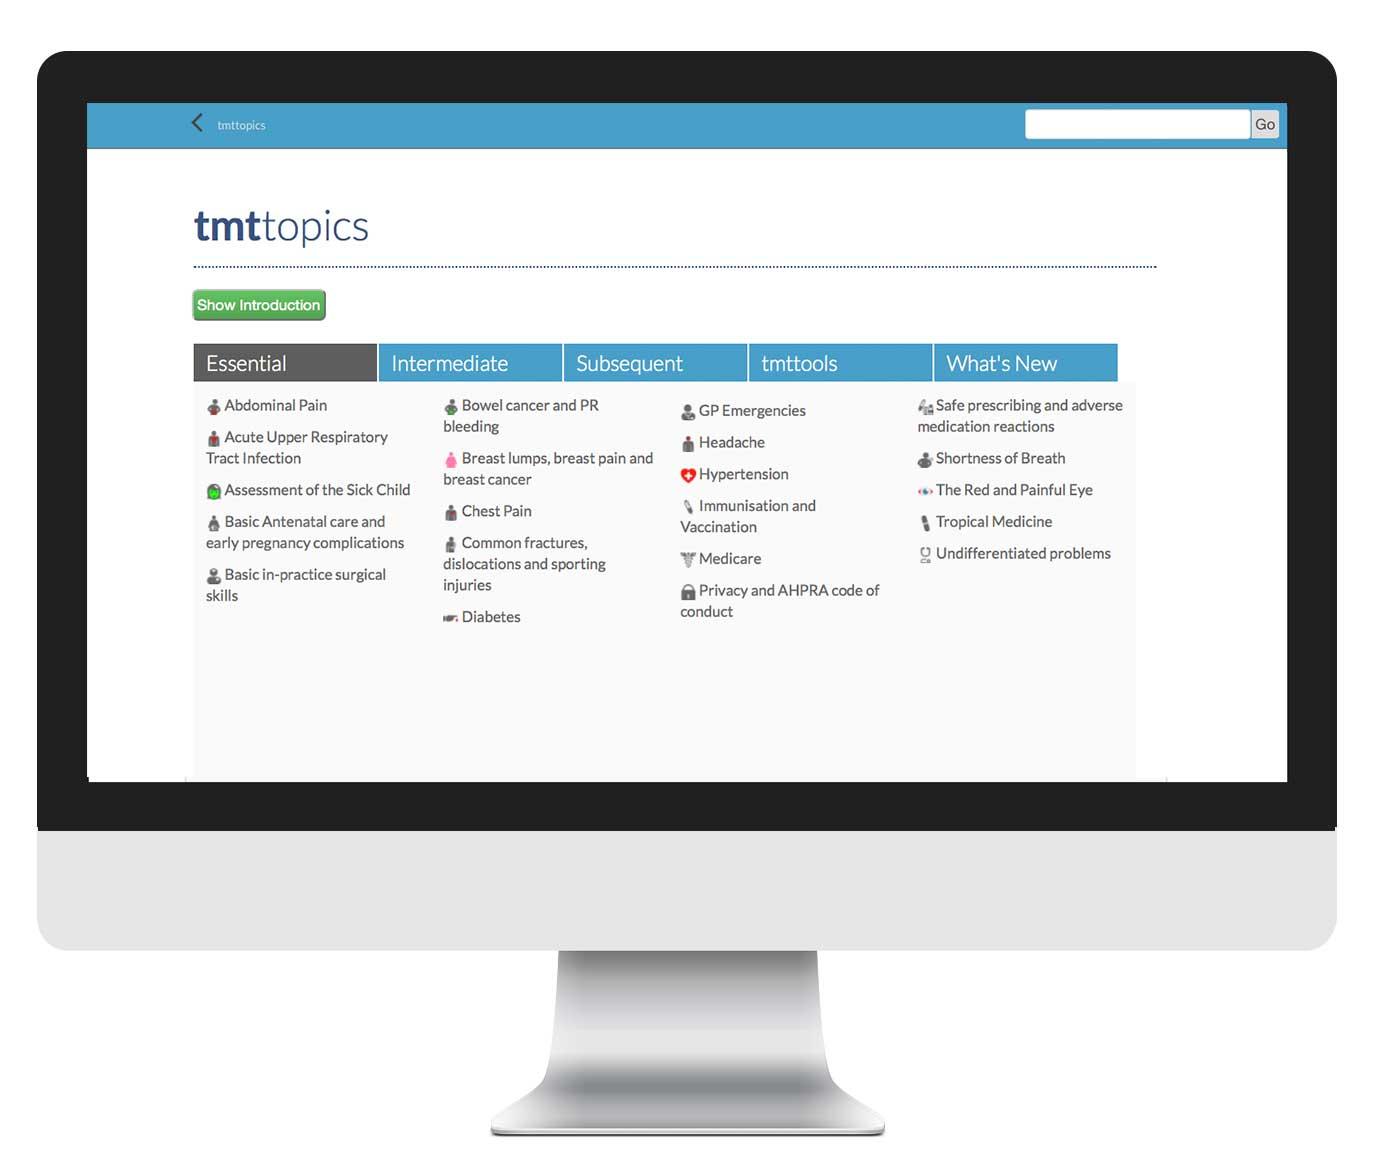 tmt-topics-home'.jpg